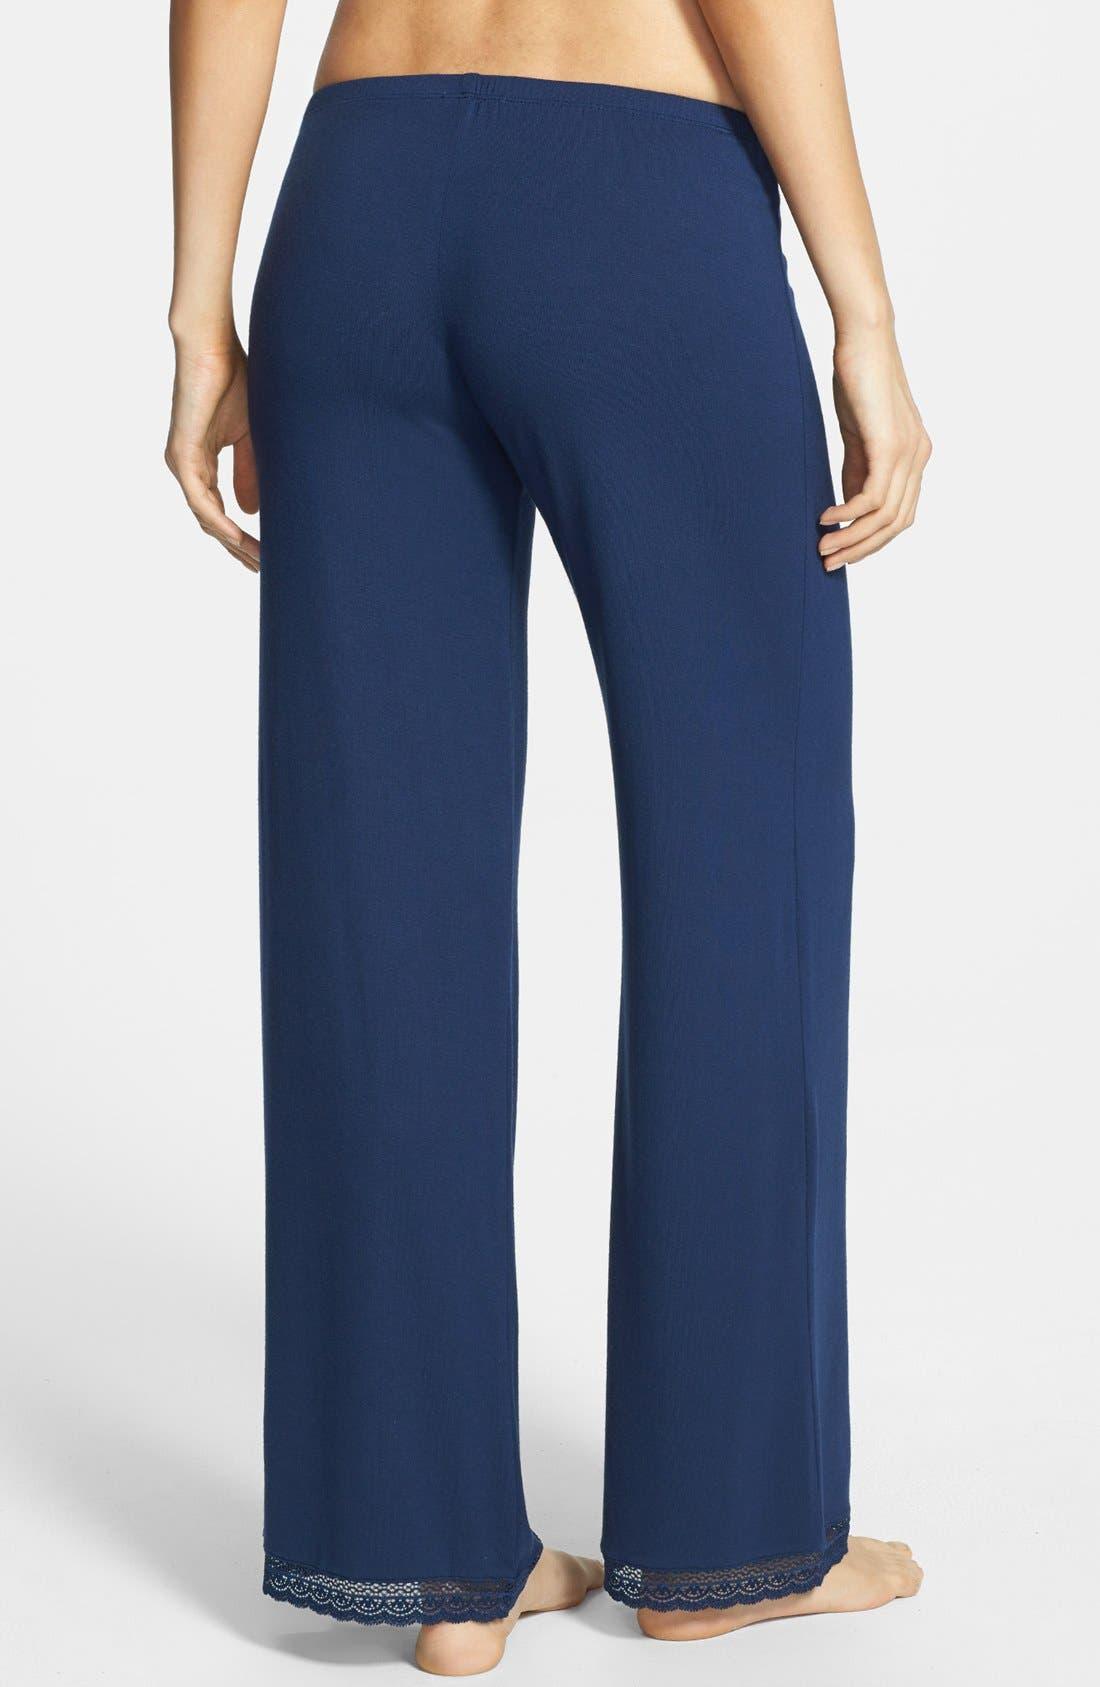 Alternate Image 2  - Eberjey 'Gisele' Lace Jersey Pajama Pants